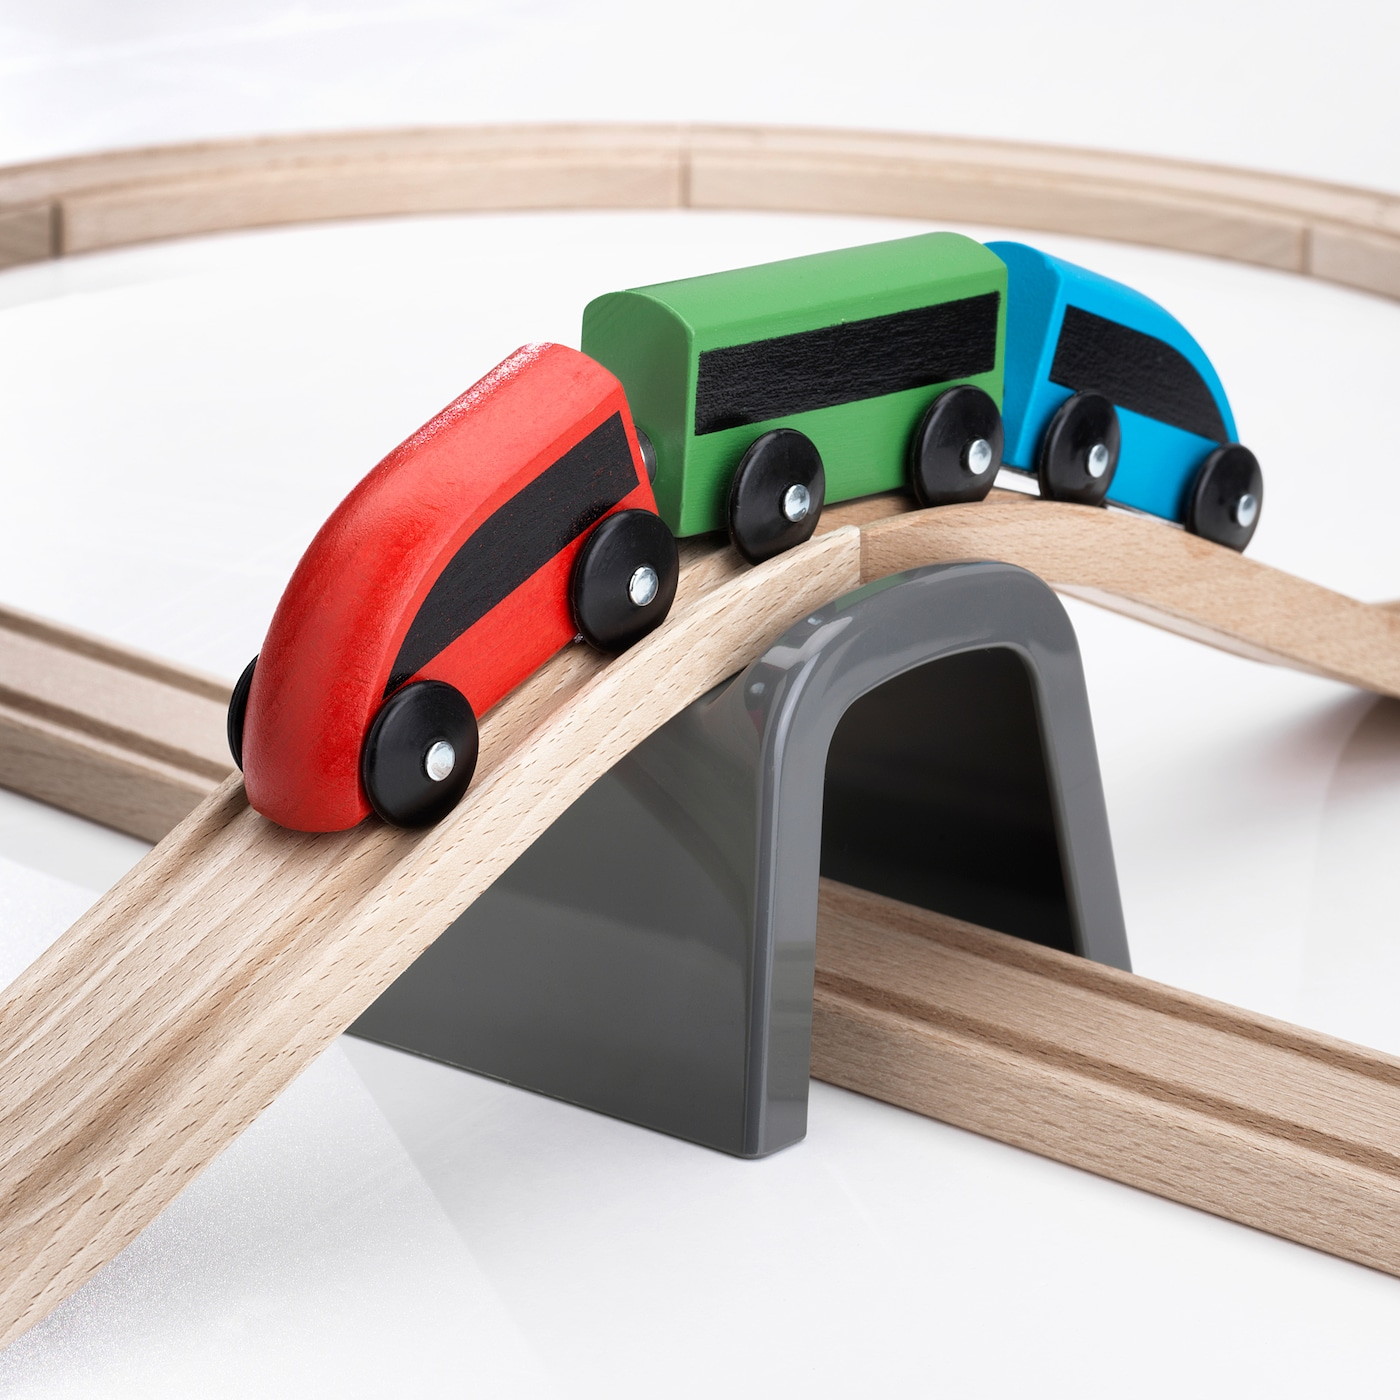 LILLABO 릴라보 기차놀이기본세트, 멀티컬러